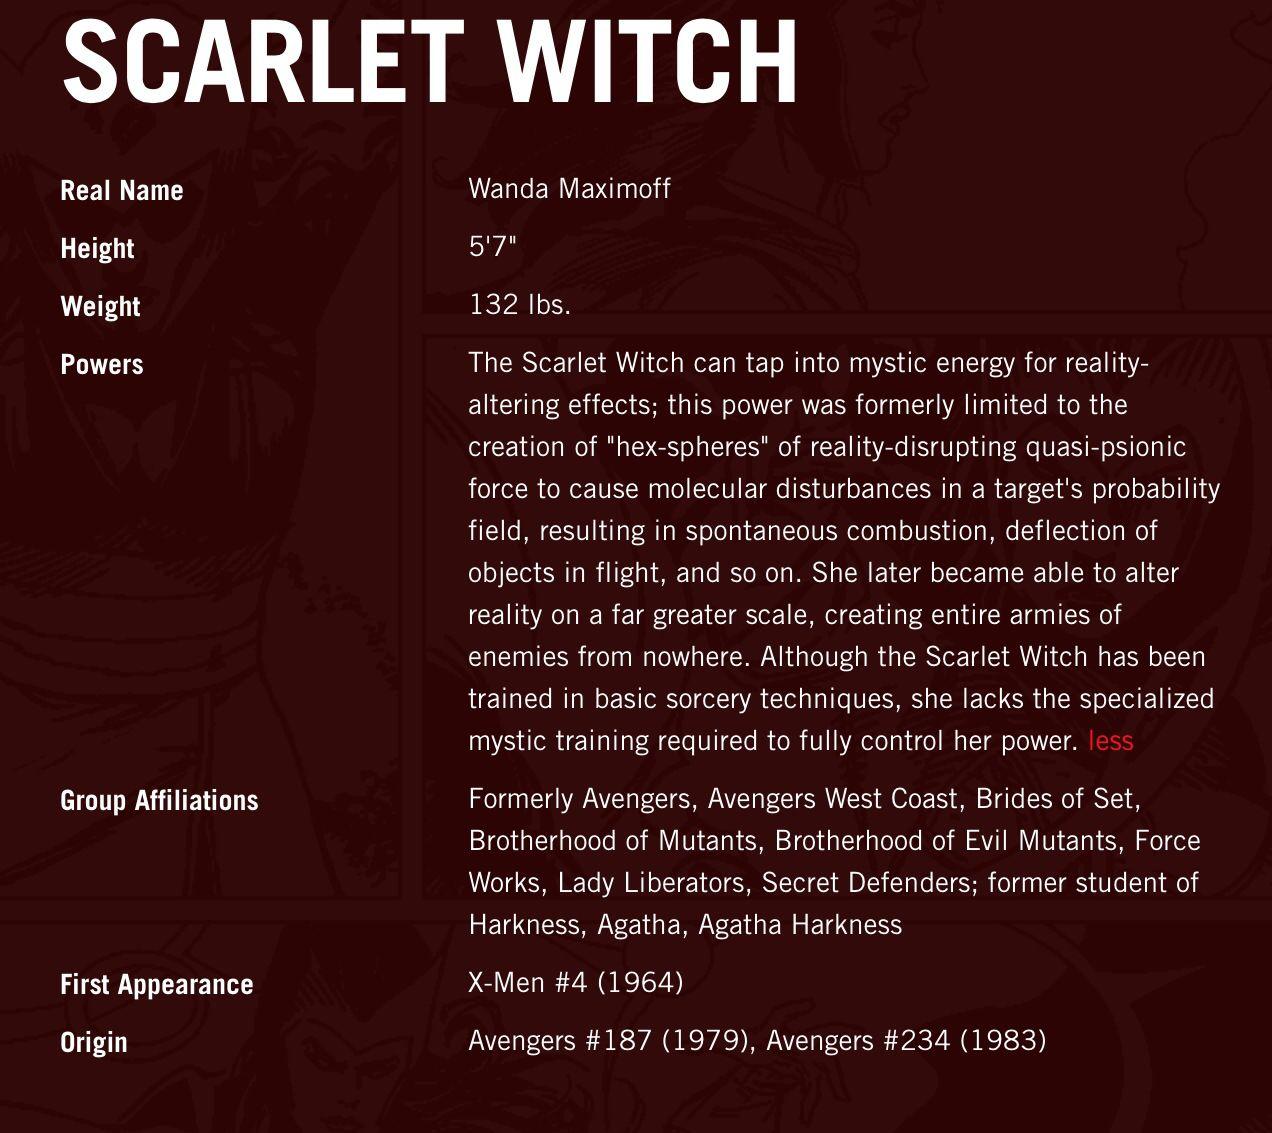 About Scarlet Witch Scarlet Witch Ms Marvel Captain Marvel Scarlet